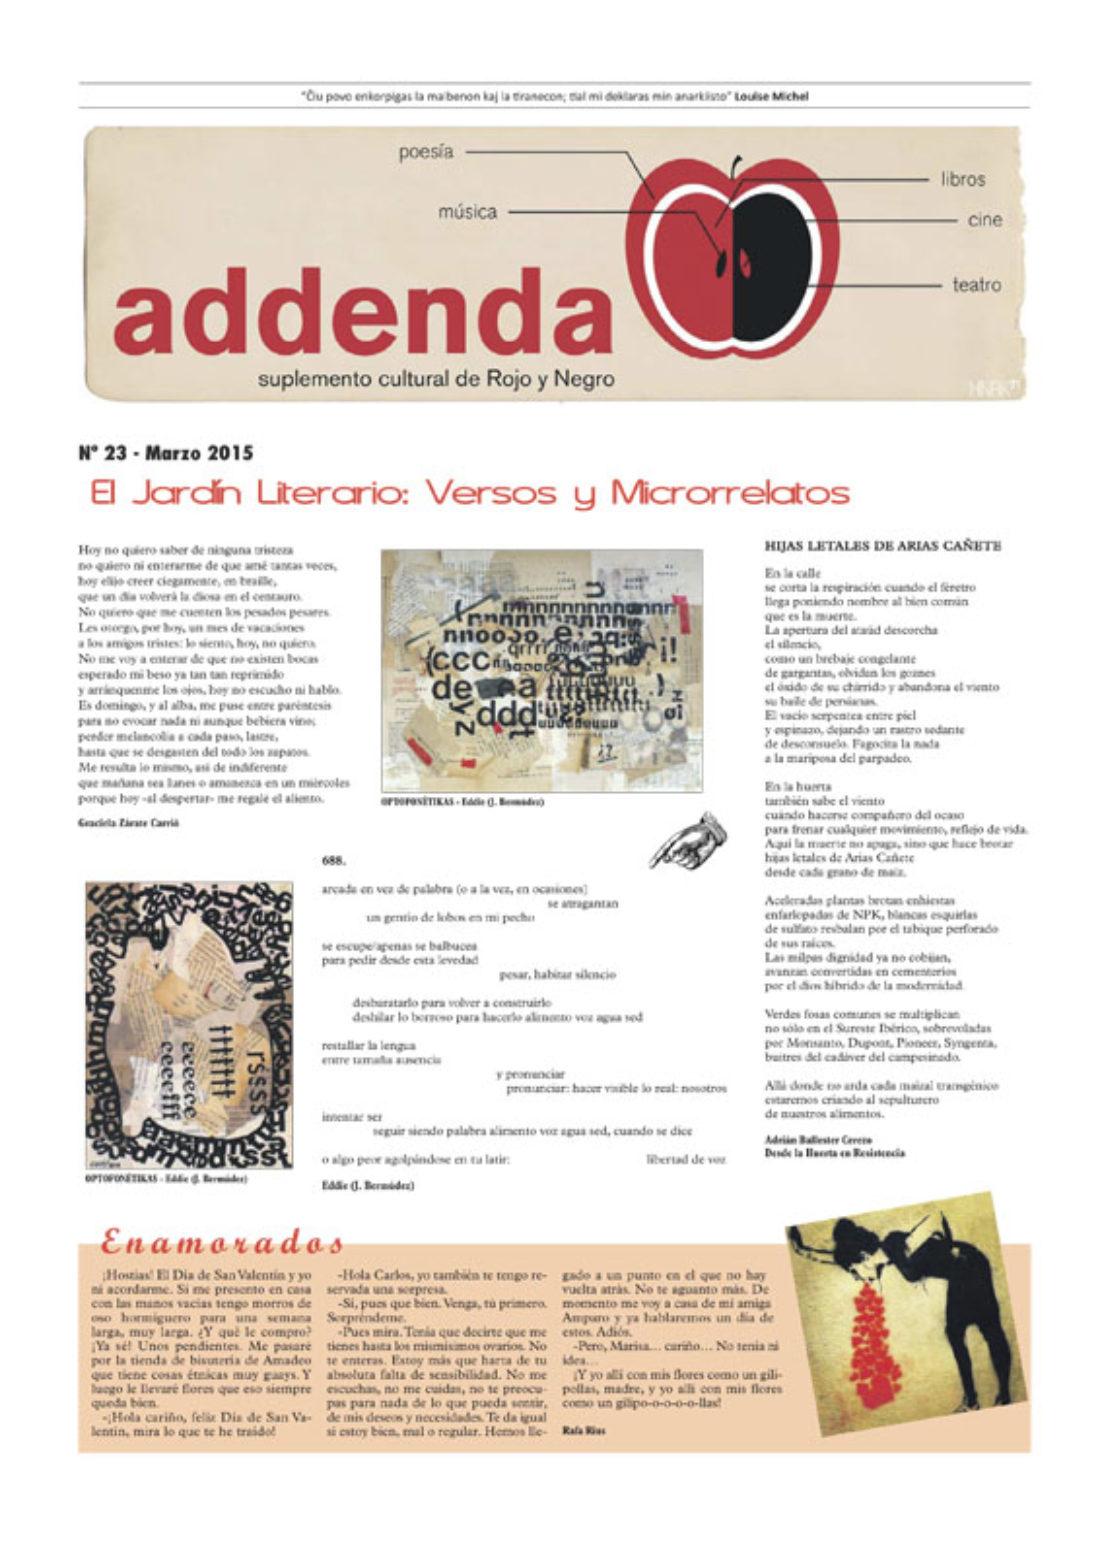 Addenda, suplemento cultural del RyN – Nº 23, marzo 2015